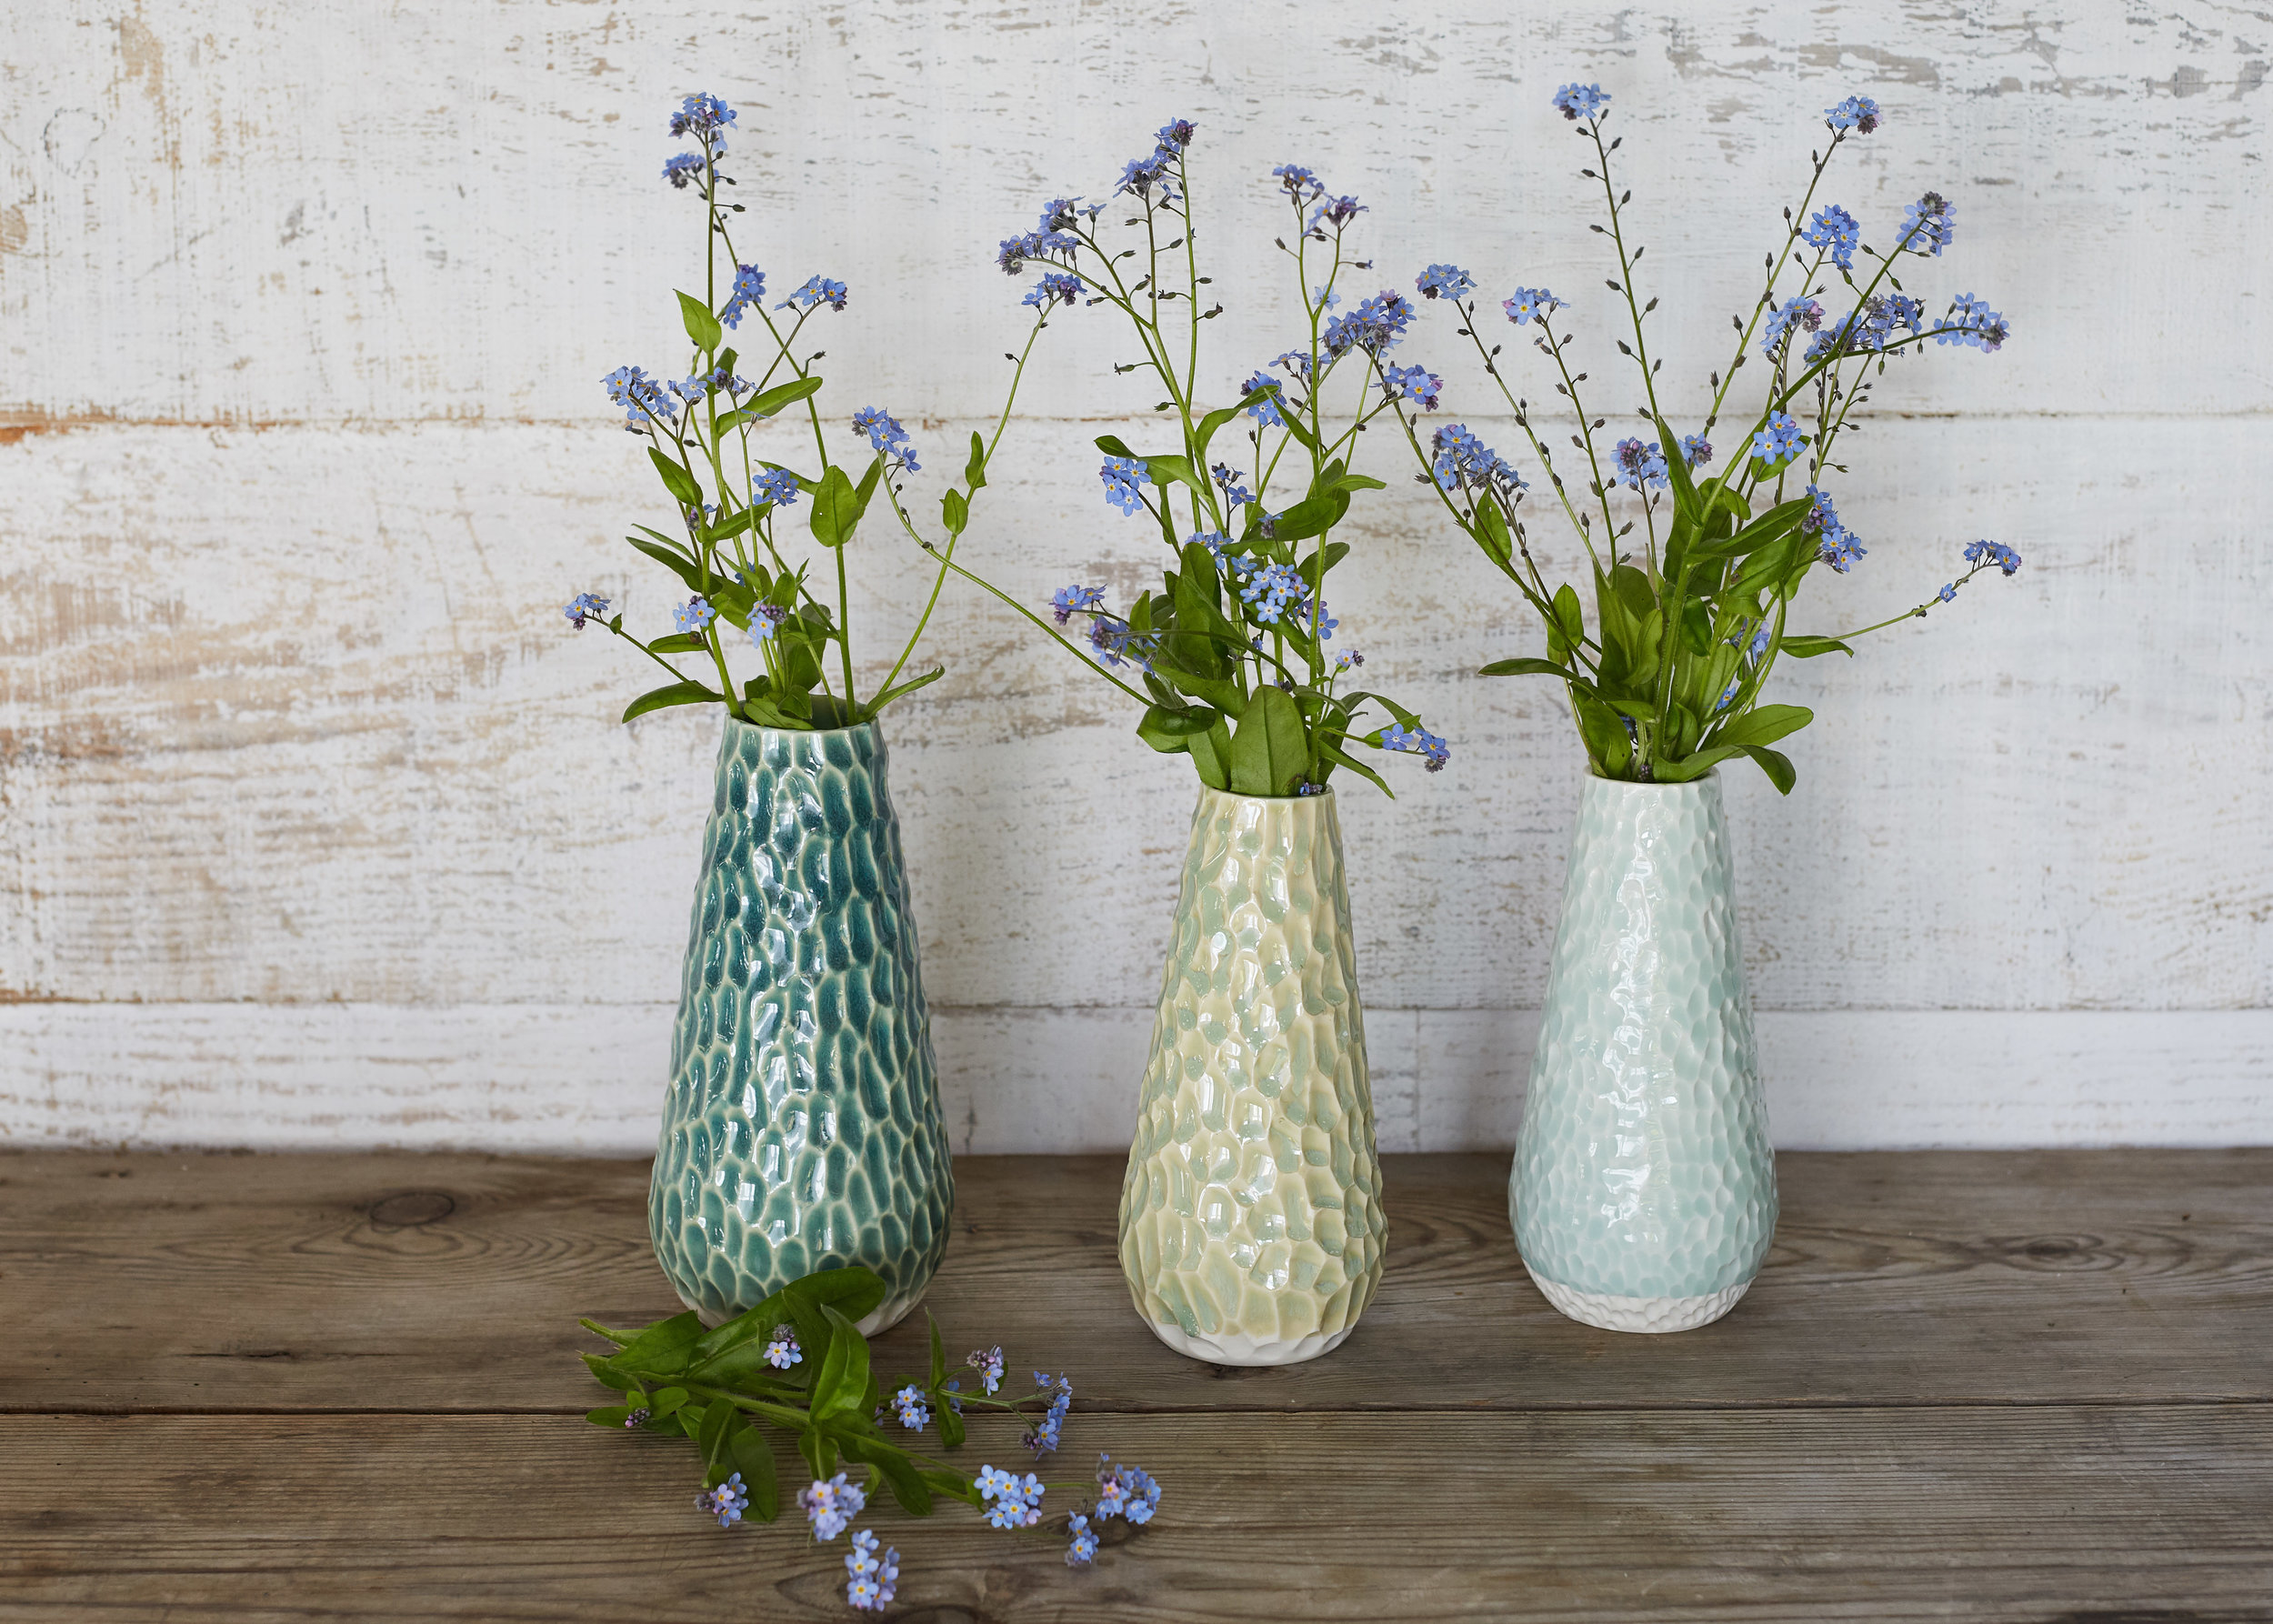 Clara-Castner-porcelain vased vases photo by Yeshen Venema.jpg